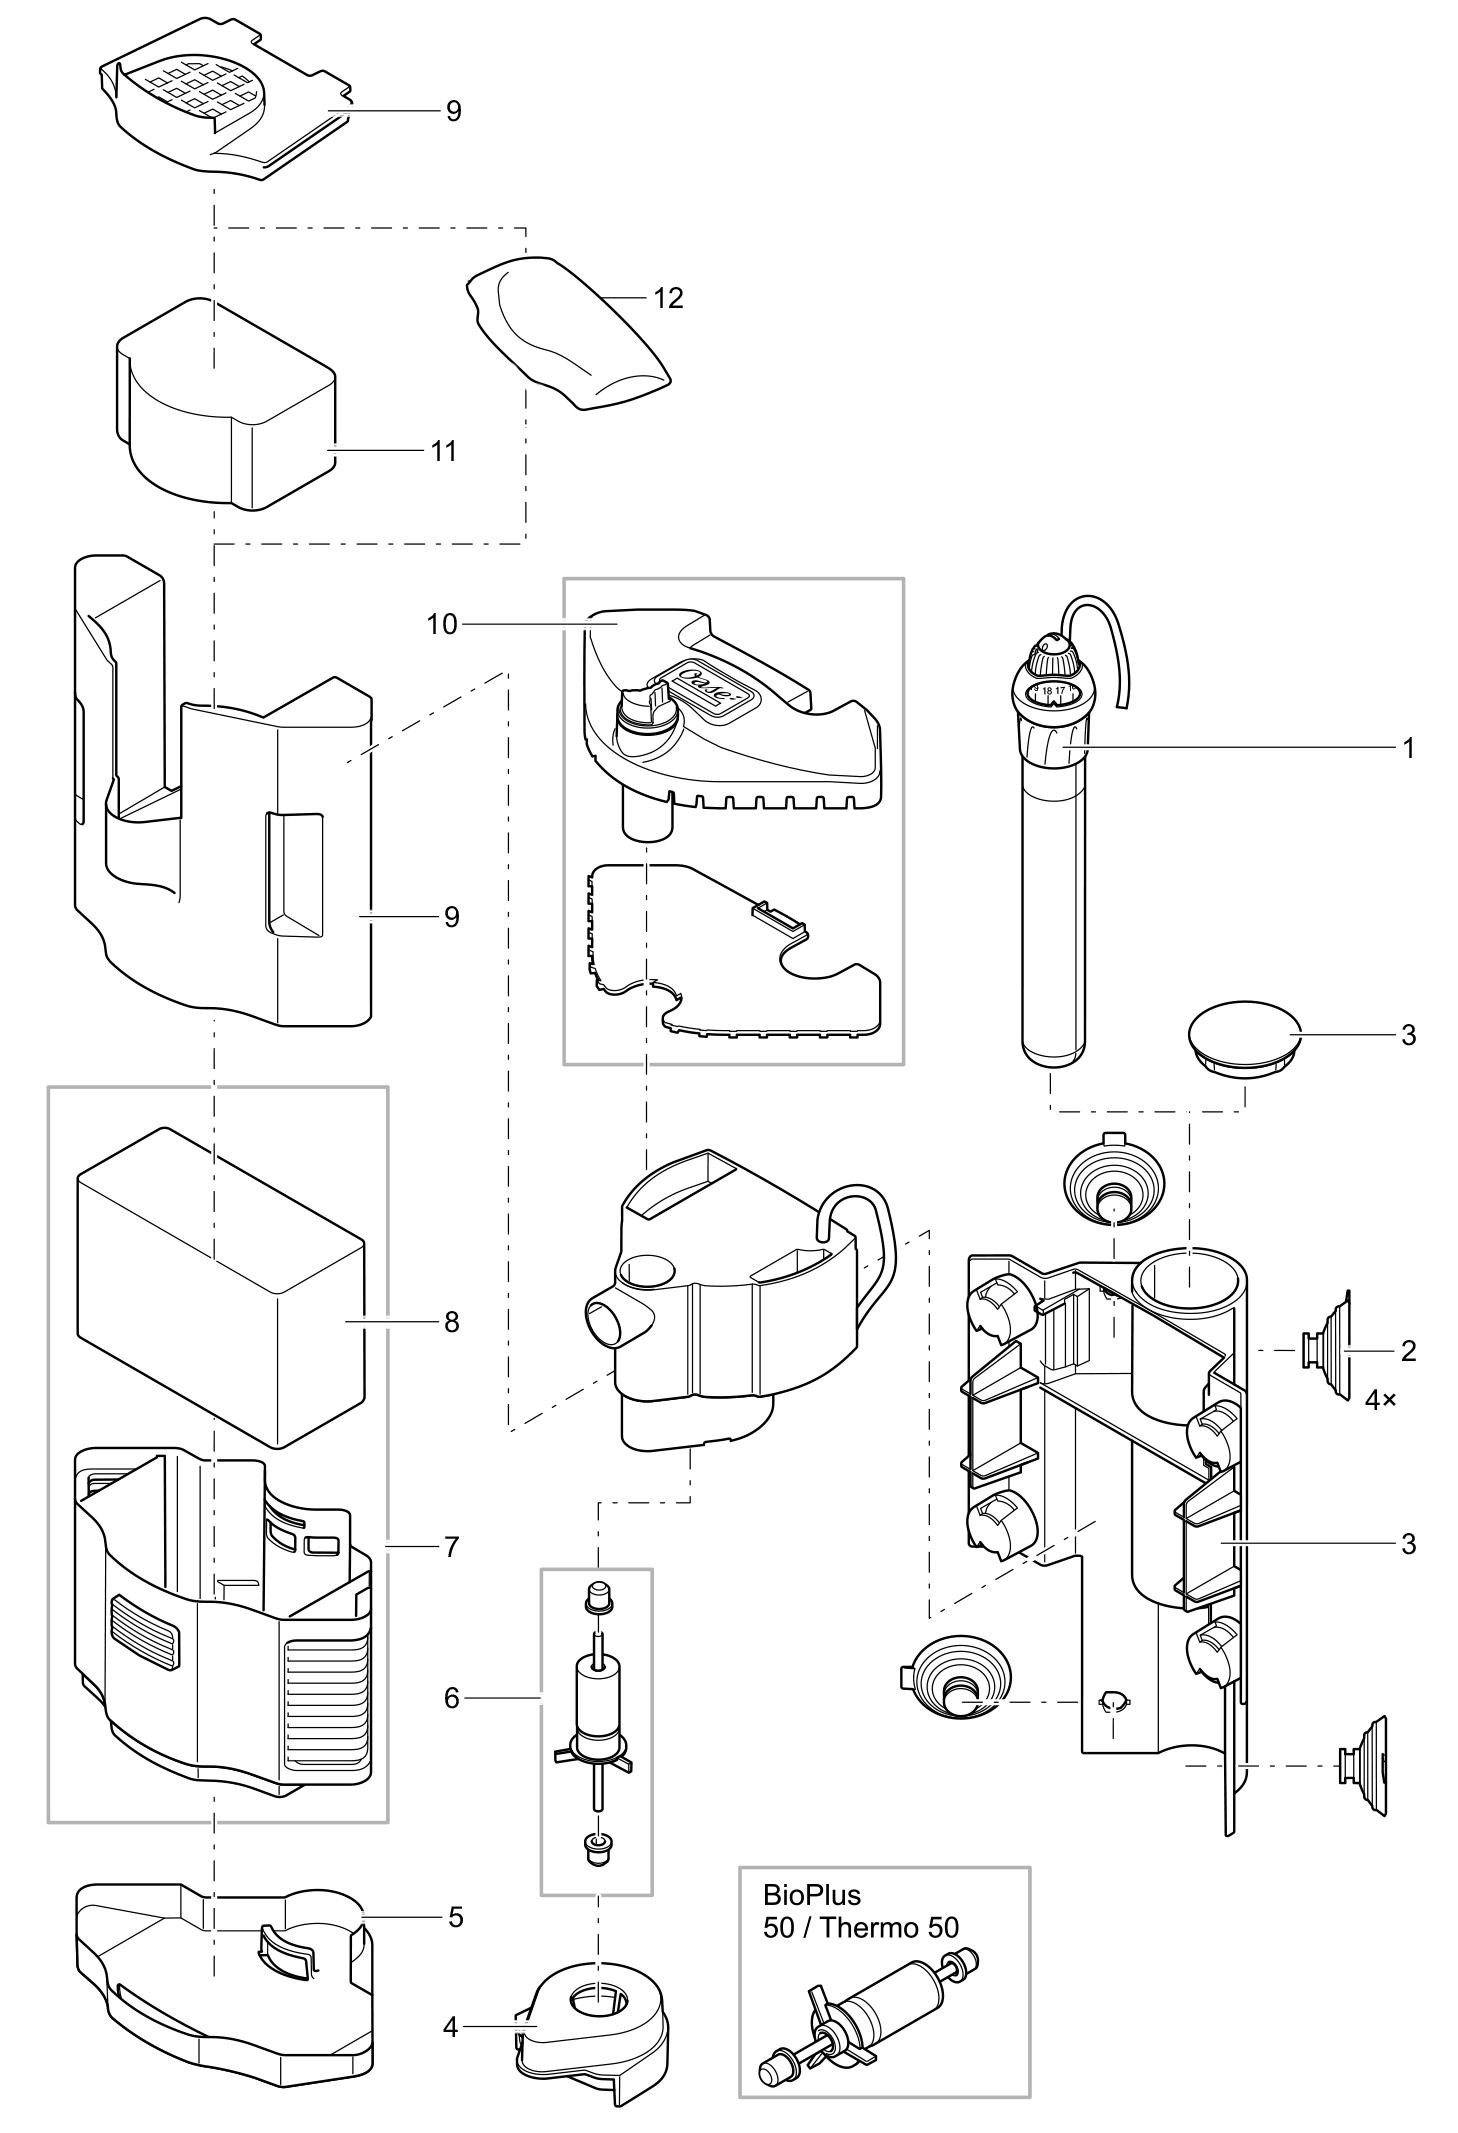 BioPlus thermo 50.jpg